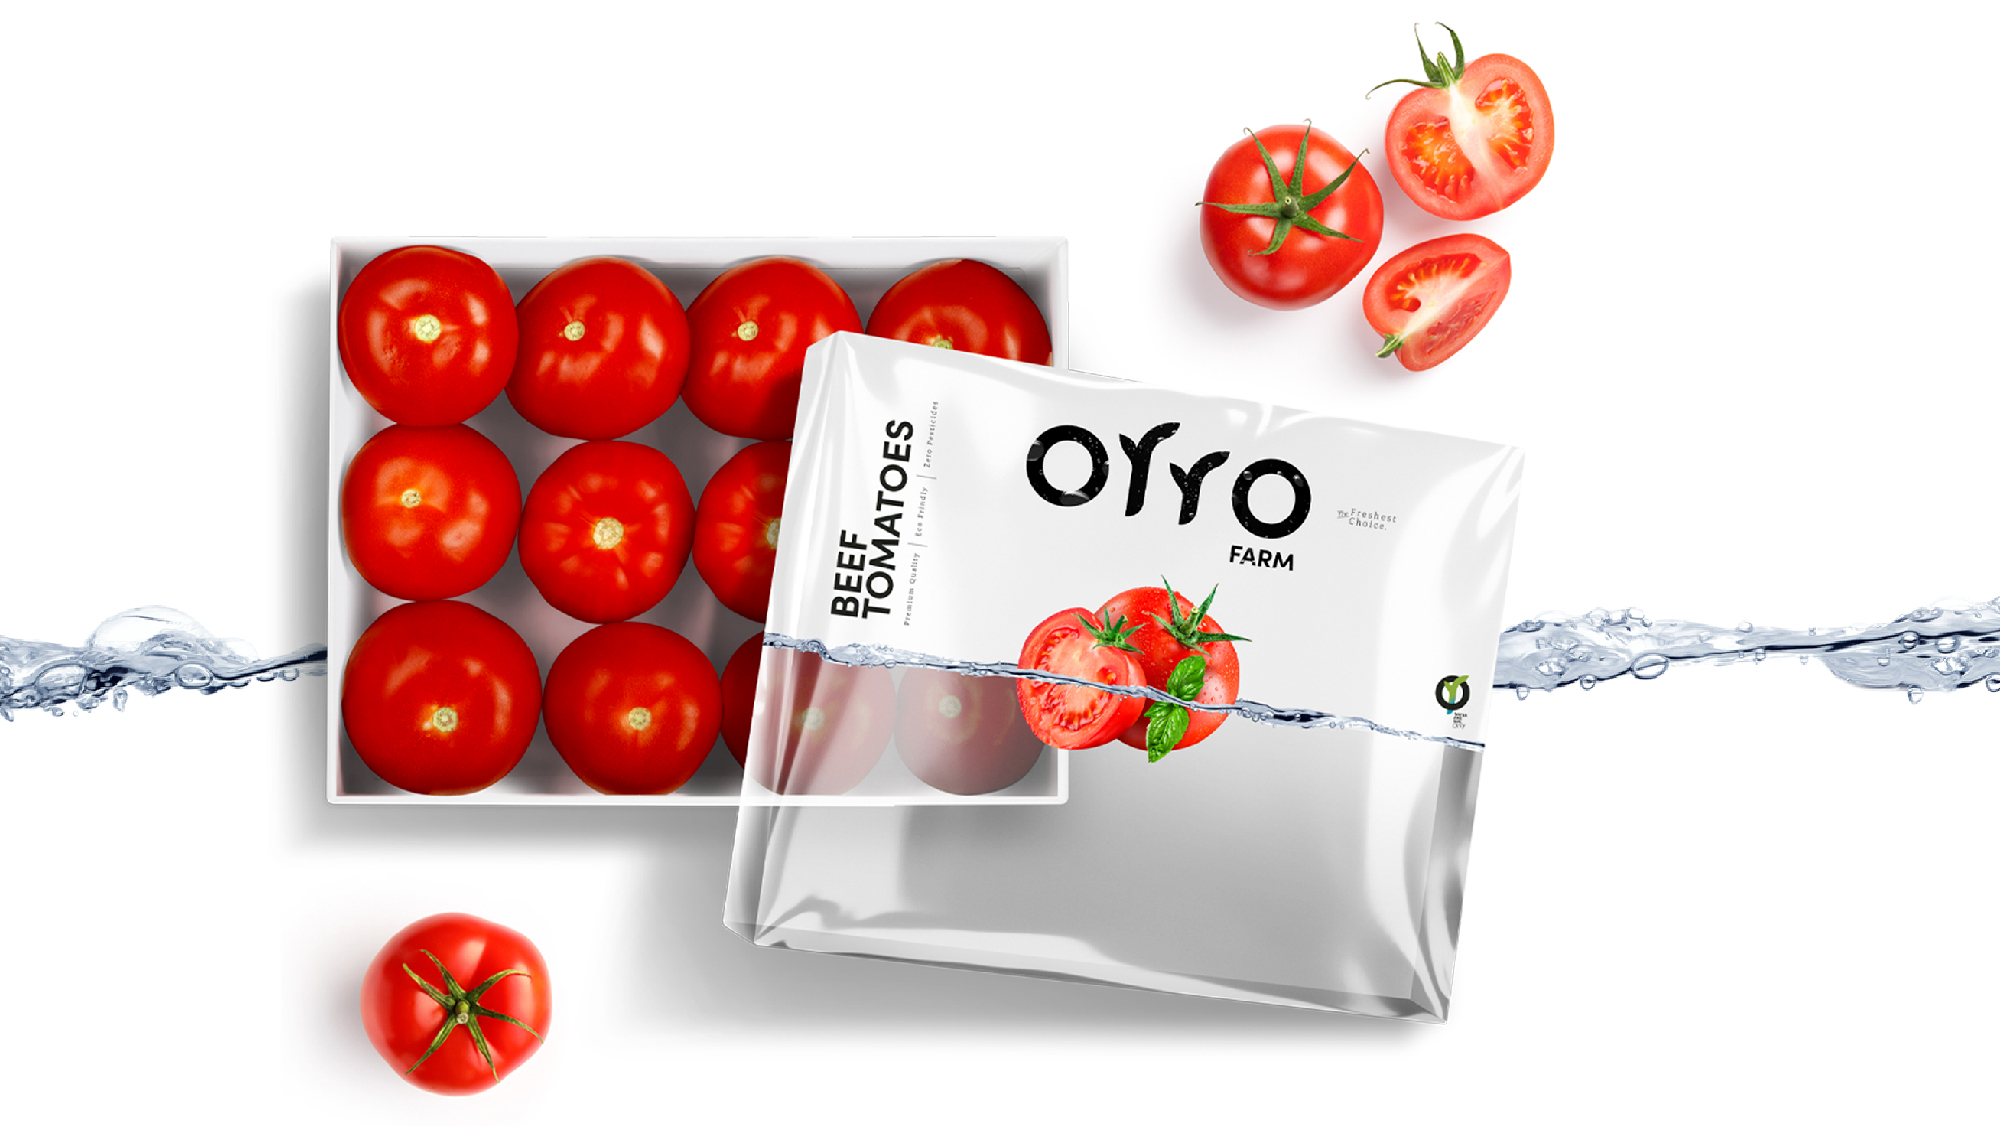 Orro-Farms-05